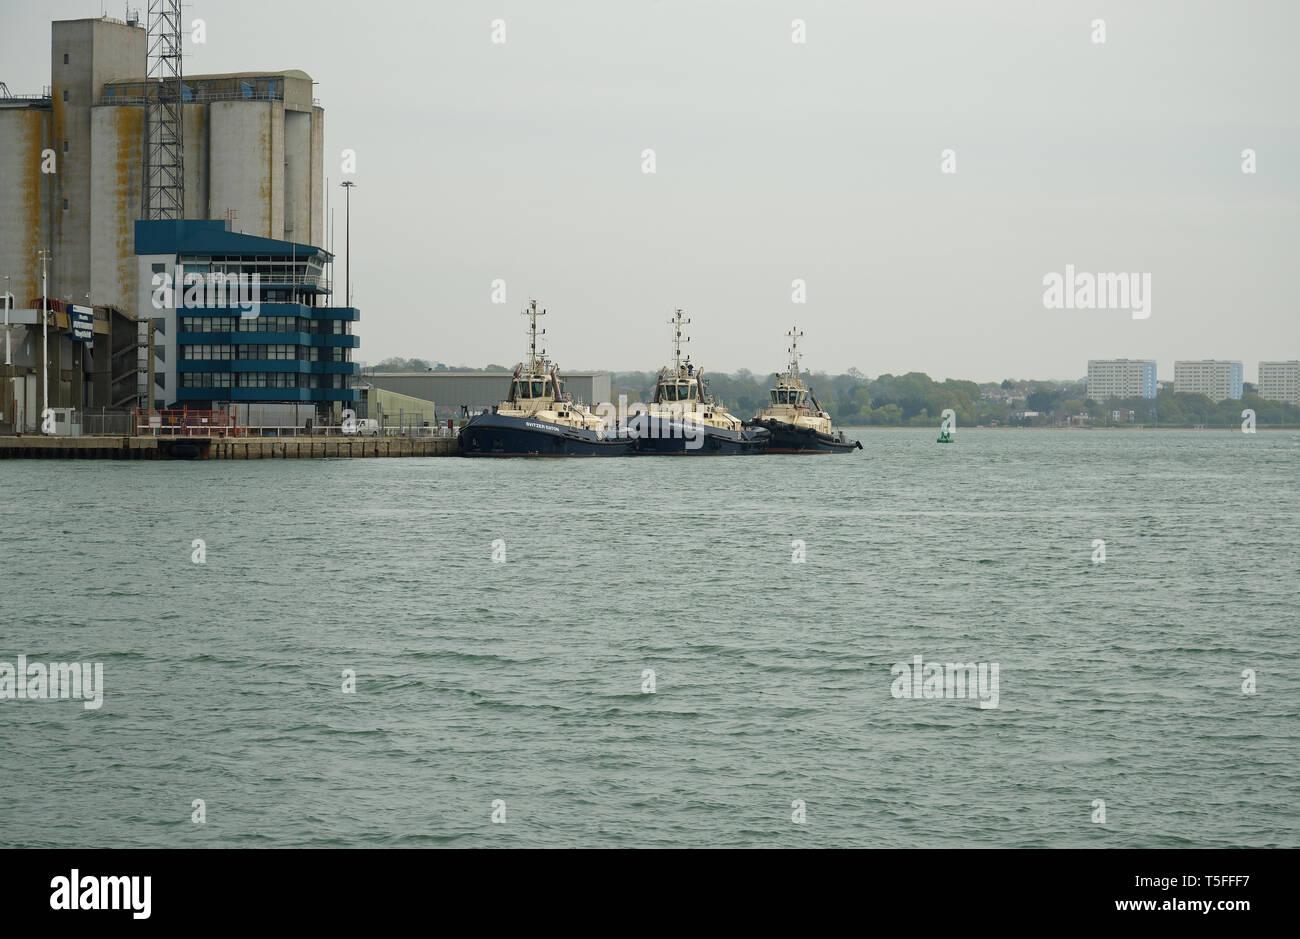 Three tugs in Southampton, Hmapshire, UK. - Stock Image